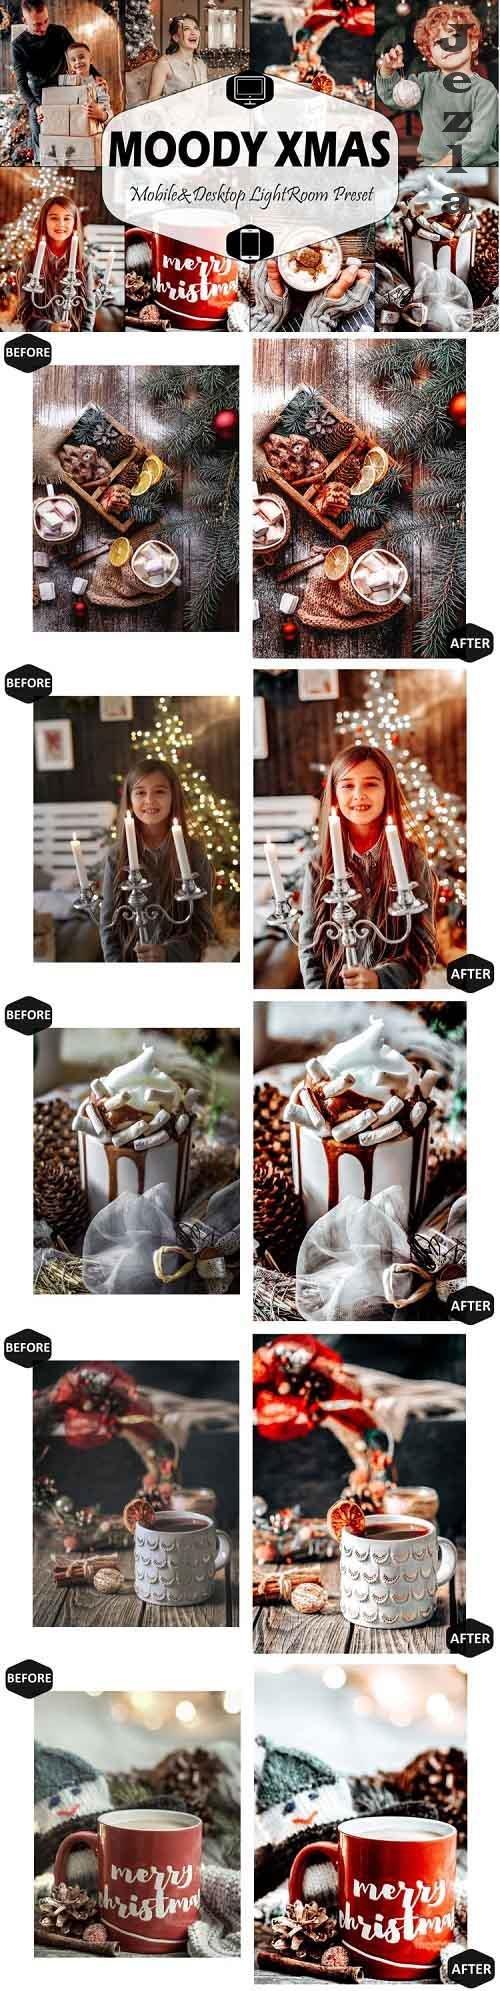 10 Moody Xmas Mobile & Desktop Lightroom Presets, Christmas - 1010956